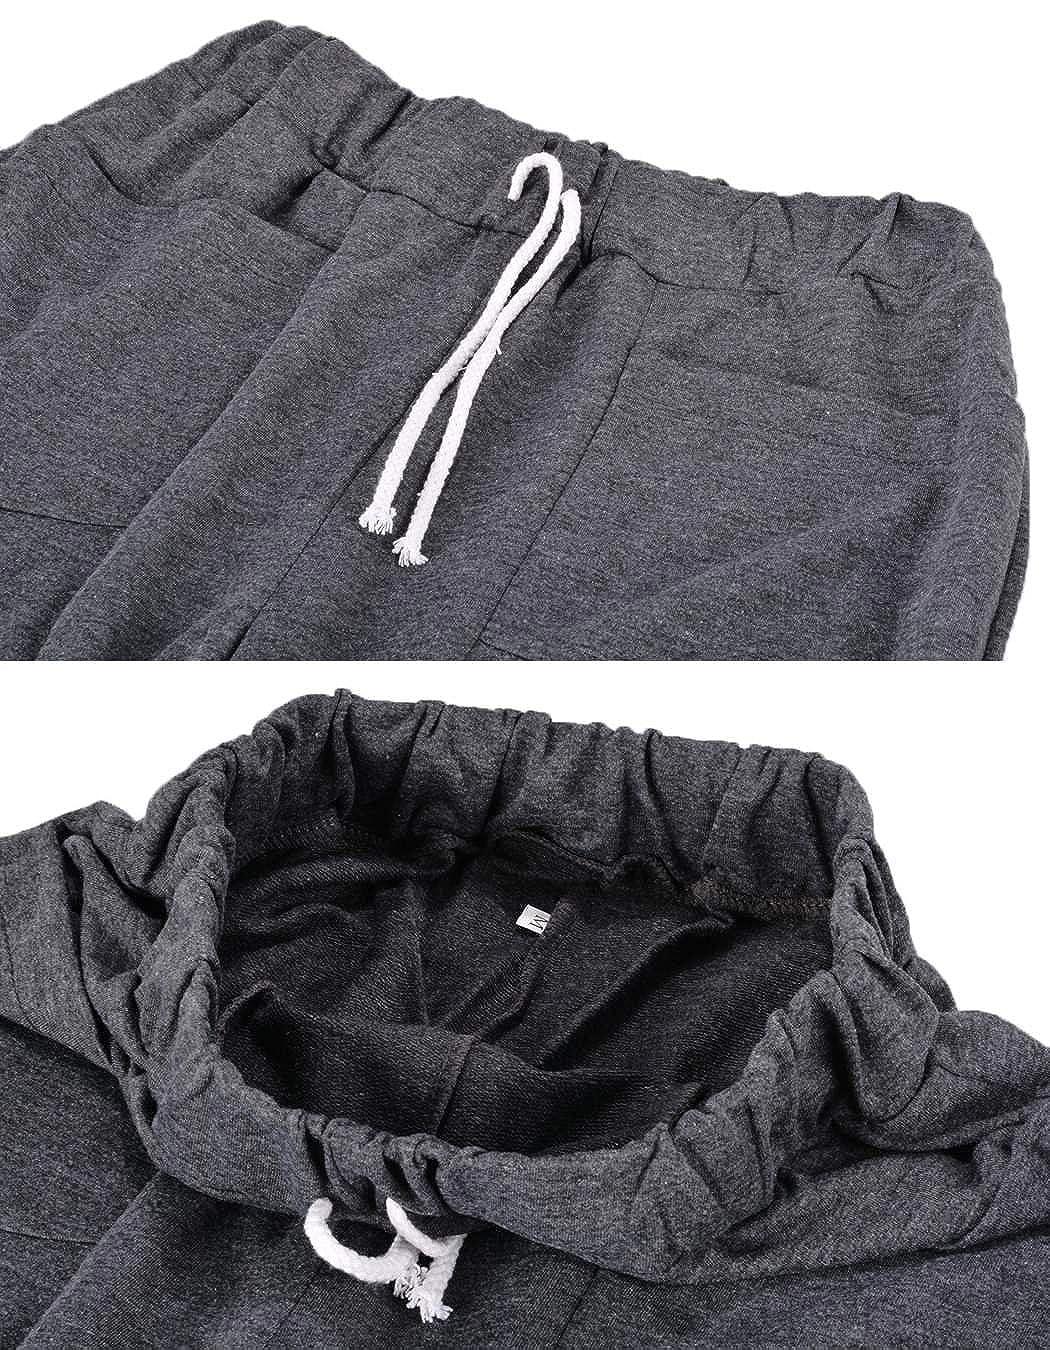 eshion New Cool Mens Regular Fit Sports Harem Pants Bag Jogging Trousers 3 Colors DZ88